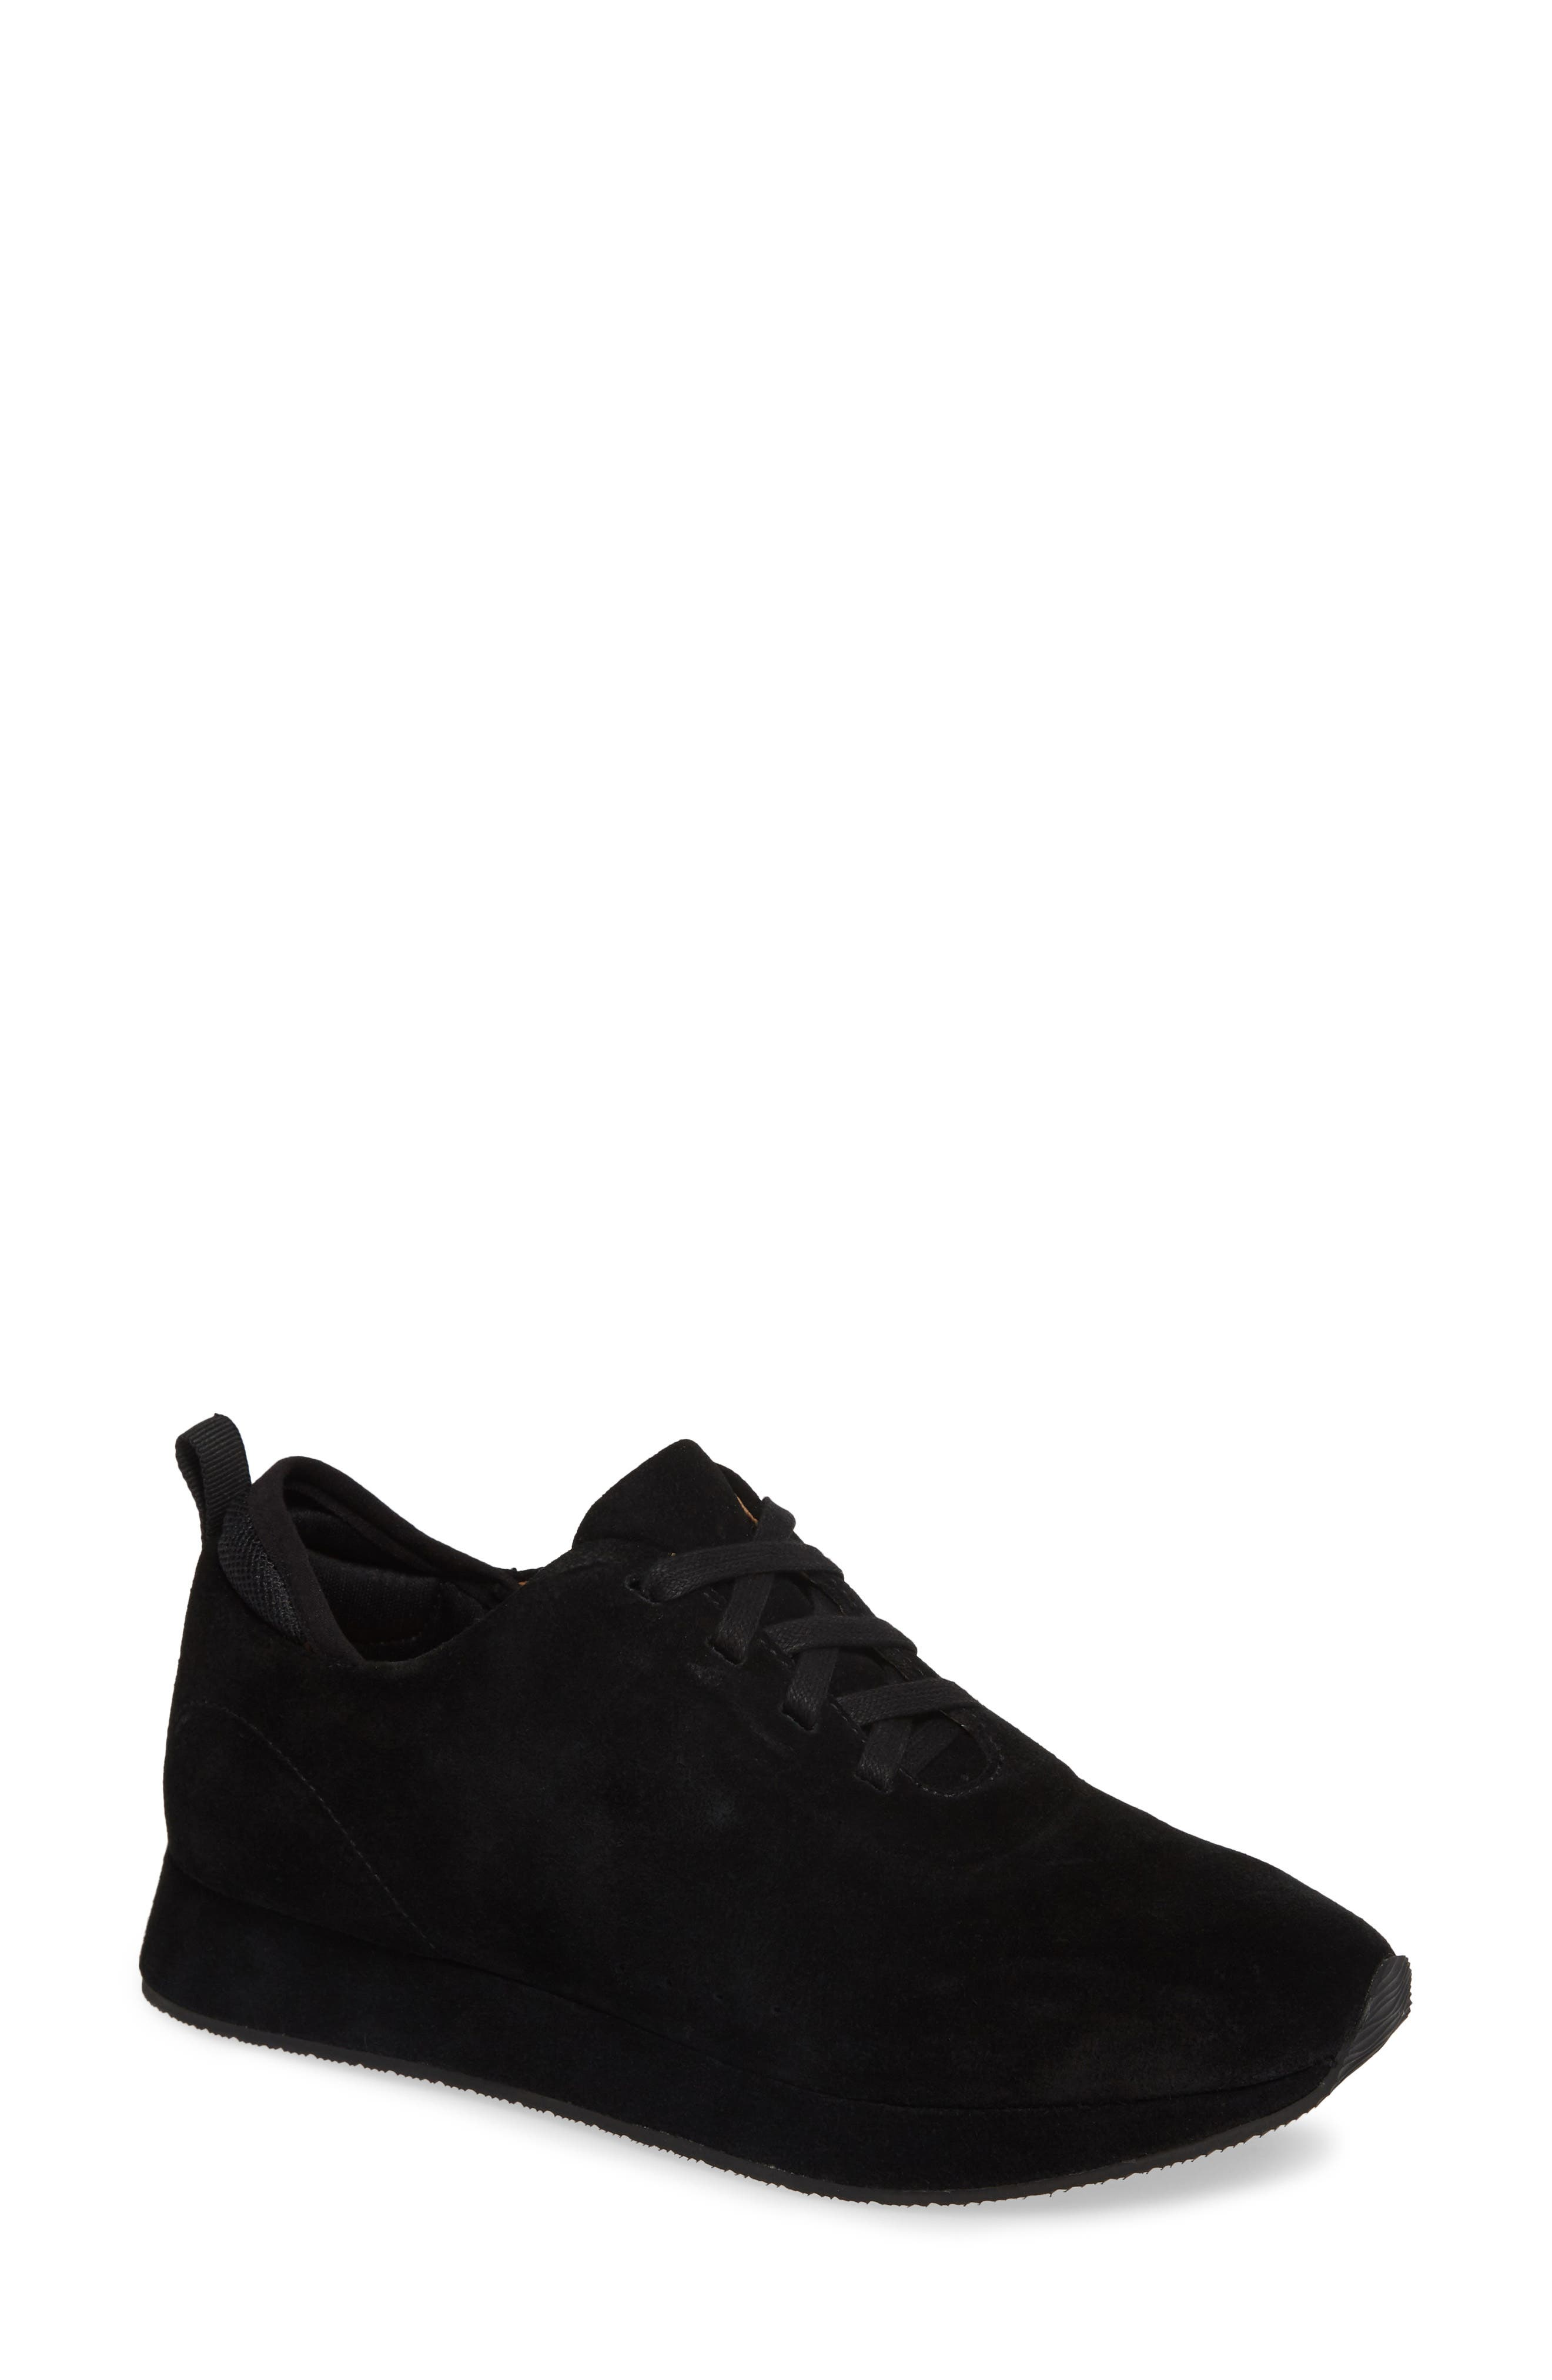 Mabel Sneaker,                         Main,                         color, BLACK SUEDE